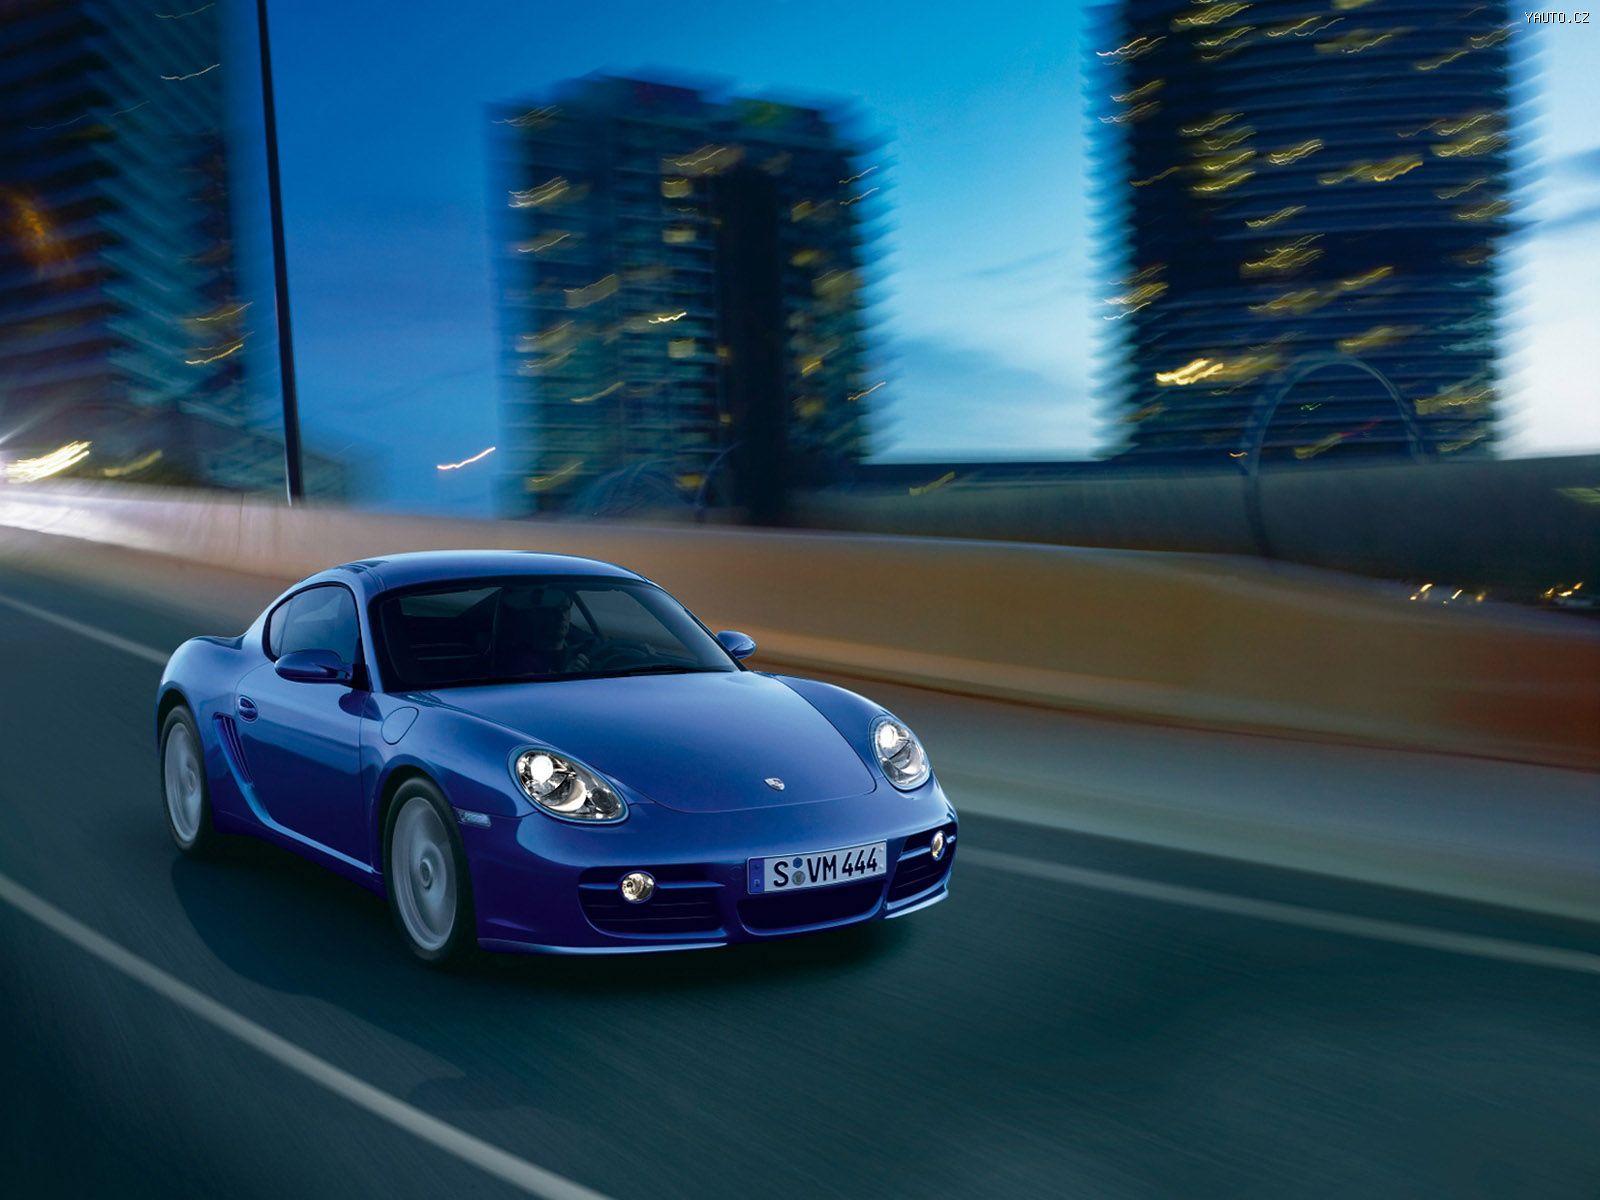 http://img.yauto.cz/tapety/Porsche_Cayman_S_2005_2.jpg